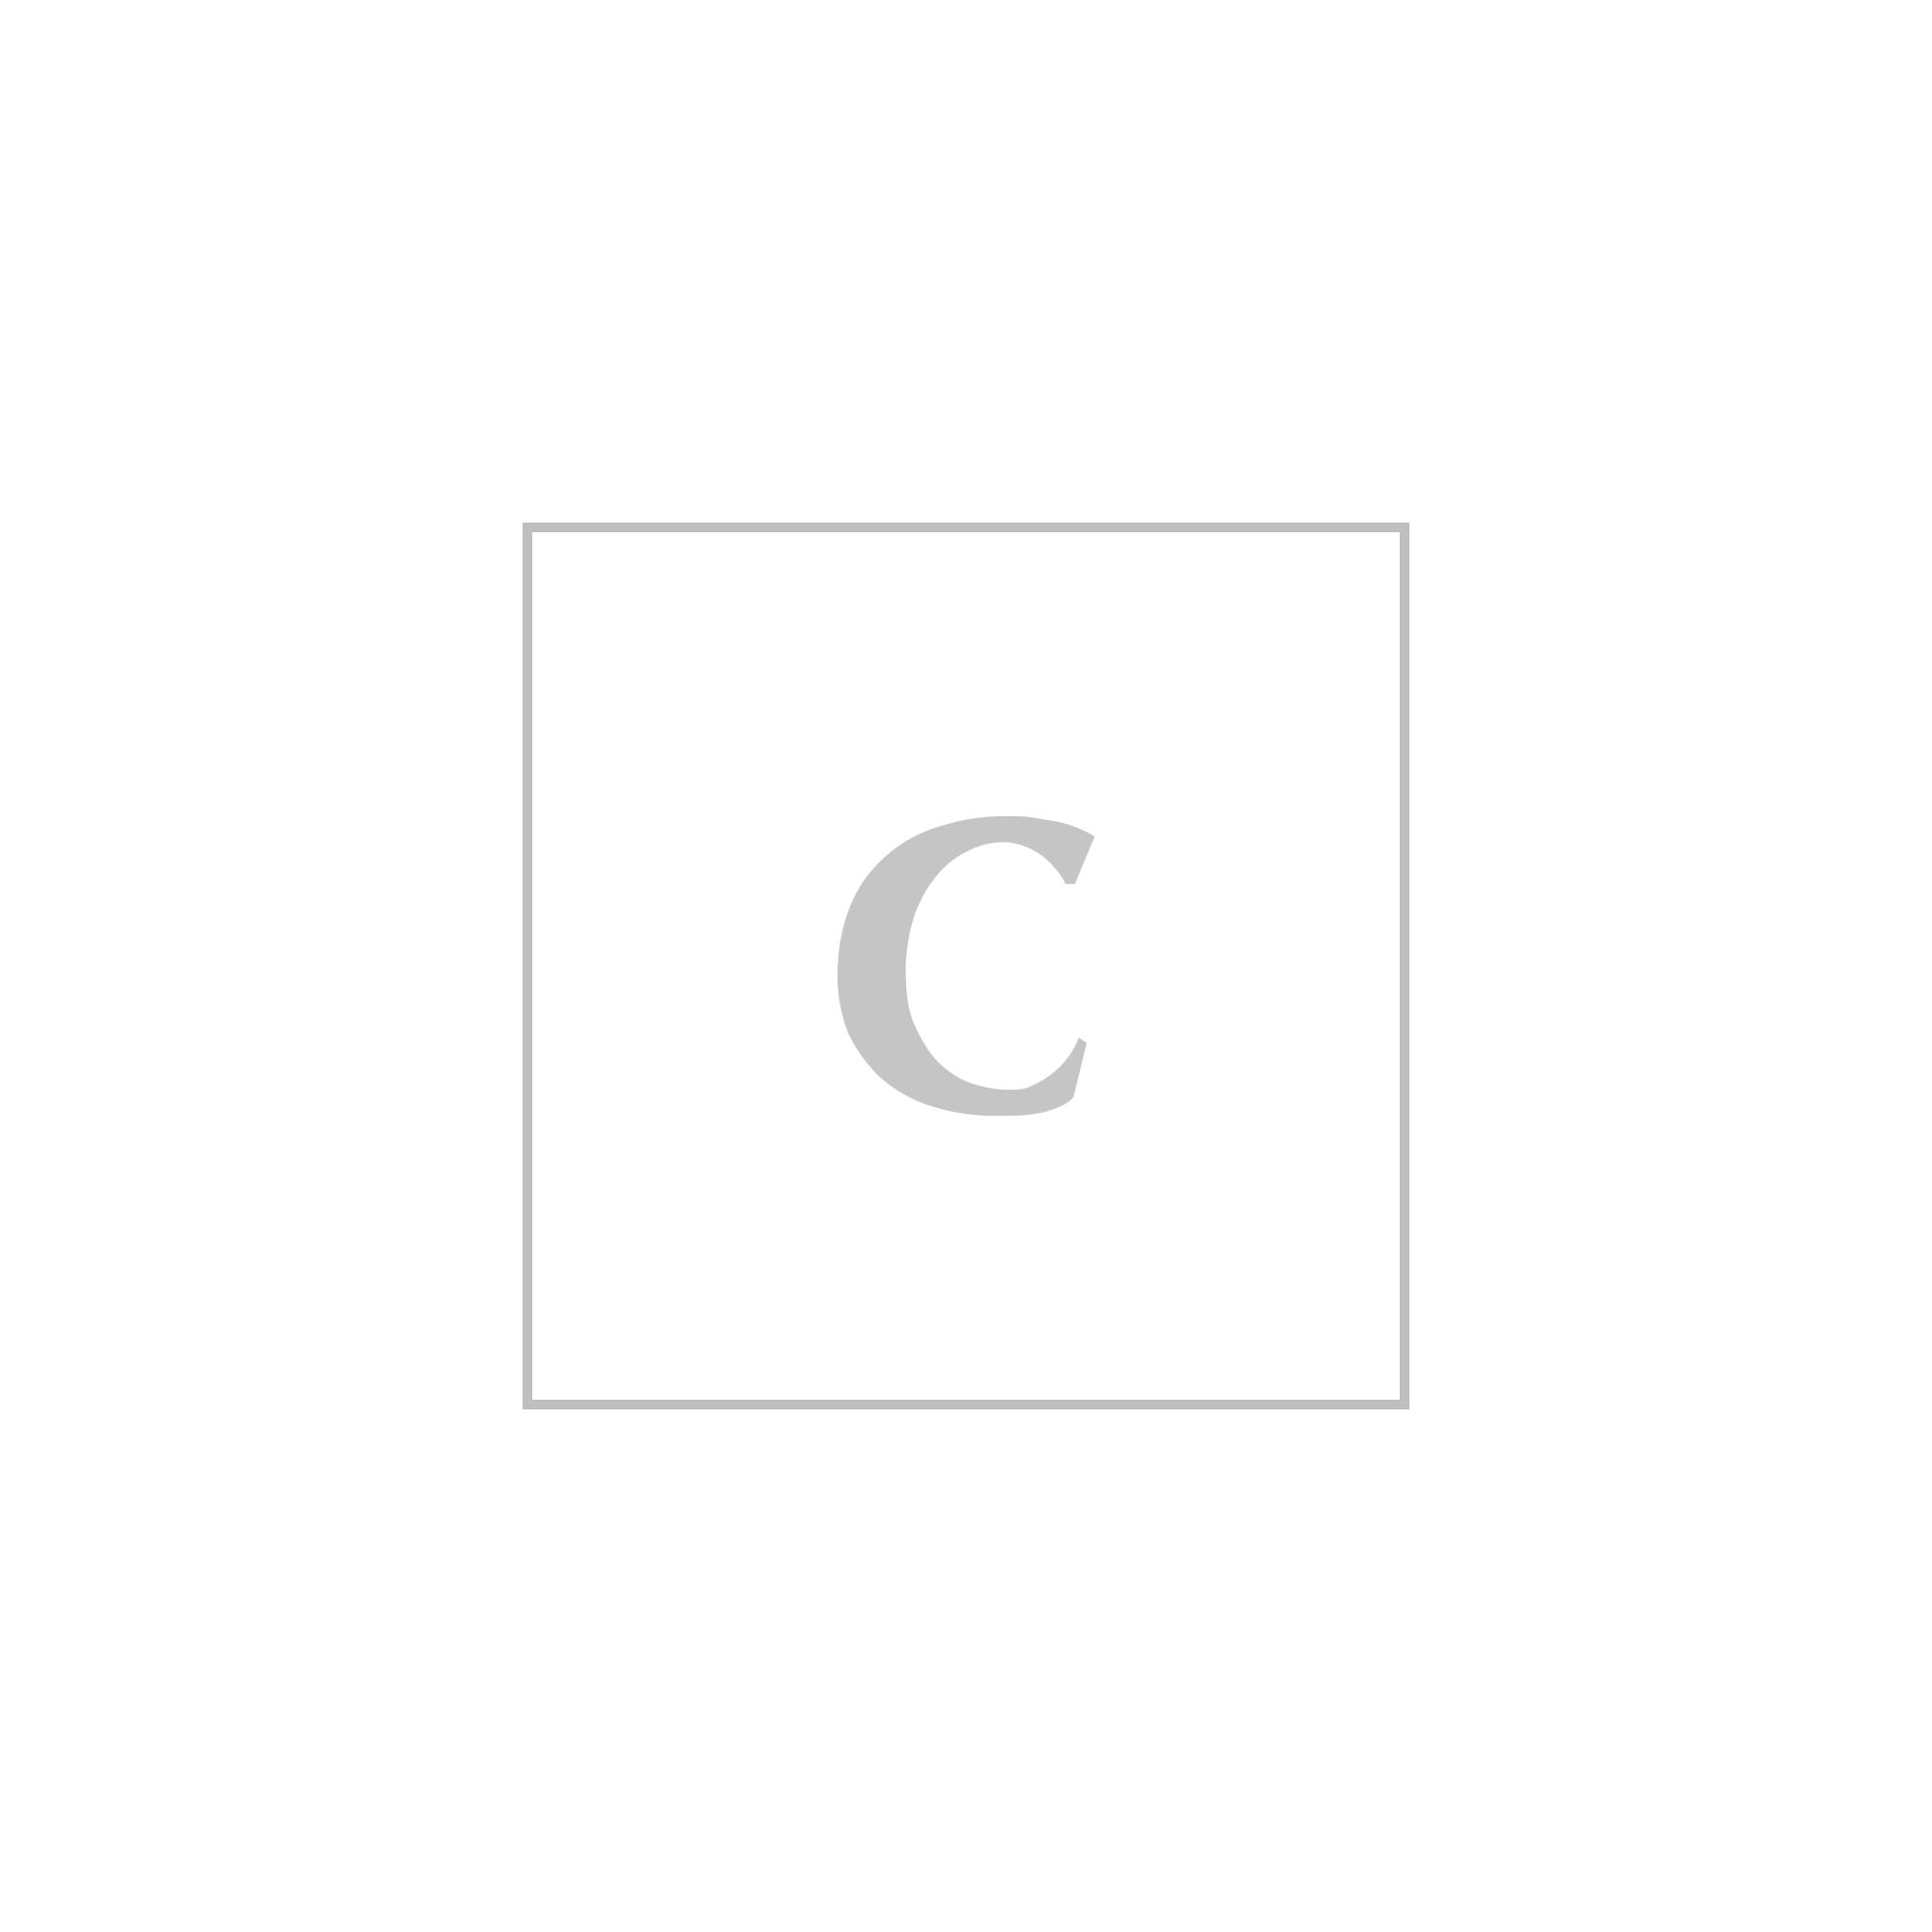 Michael michael kors eva logo shopping bag